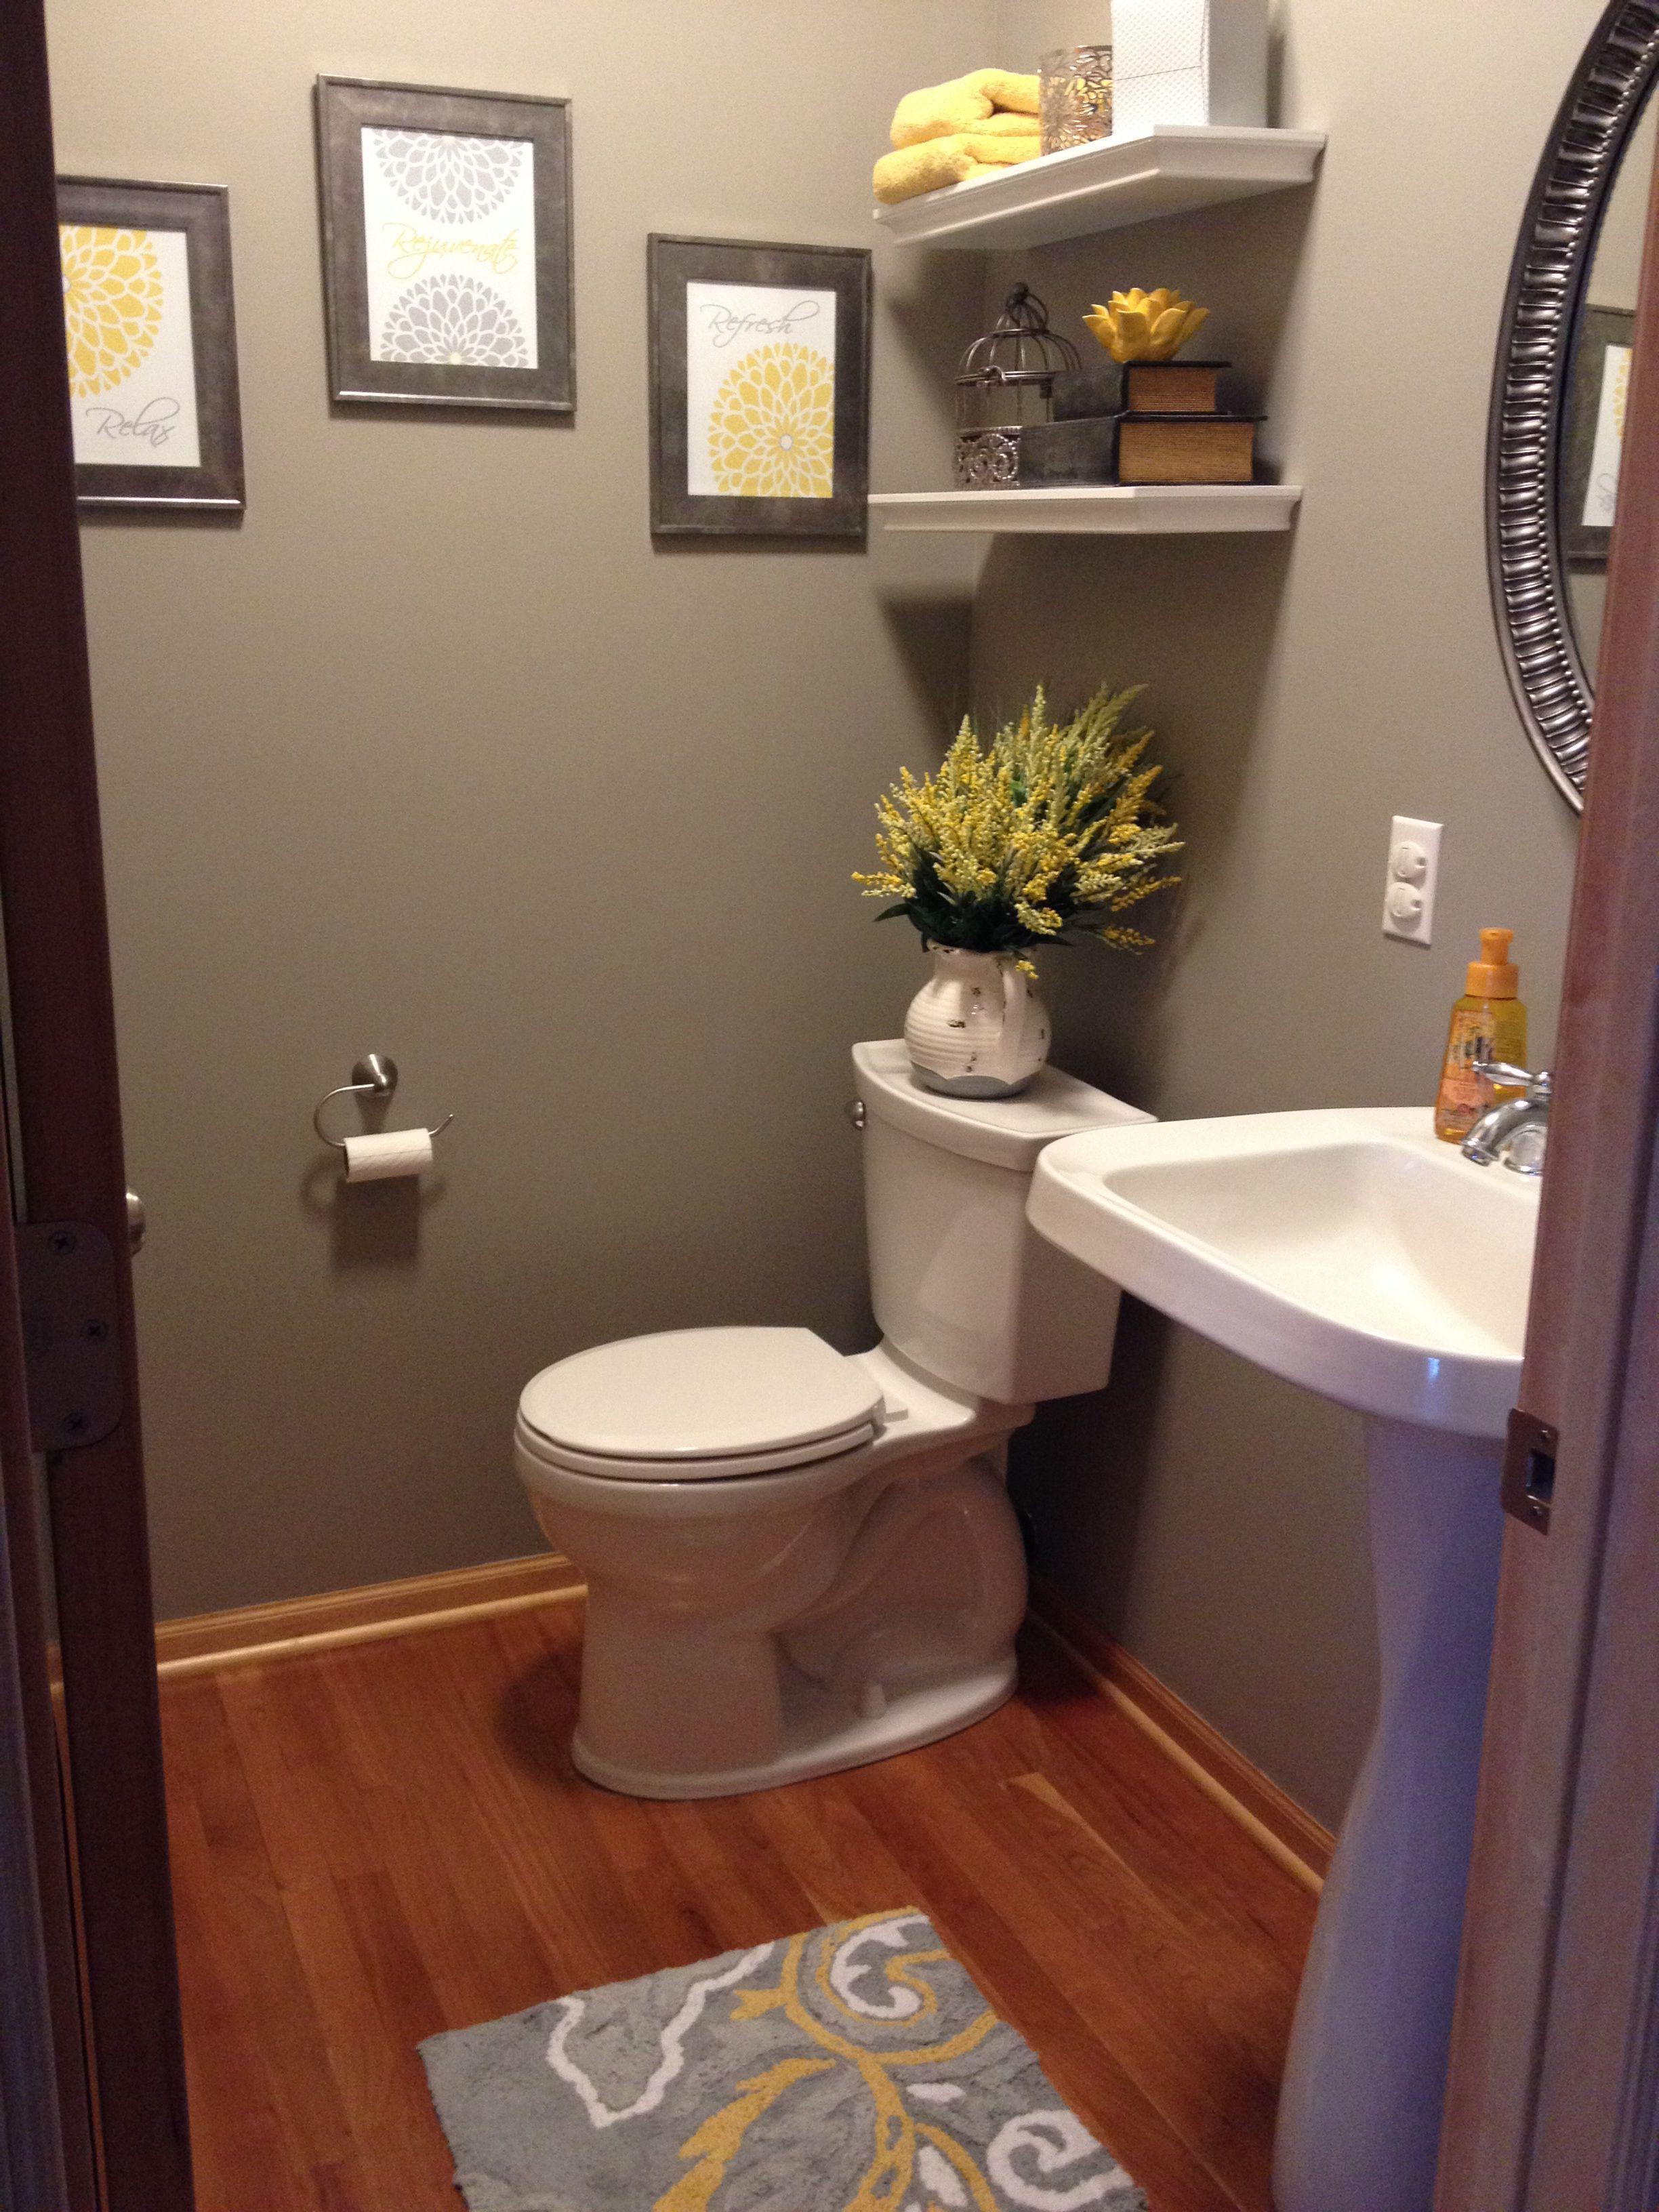 Gray And Yellow Bathroom Bathroomdecorgrayandyellow With Images Yellow Bathroom Decor Gray Bathroom Decor Yellow Bathrooms